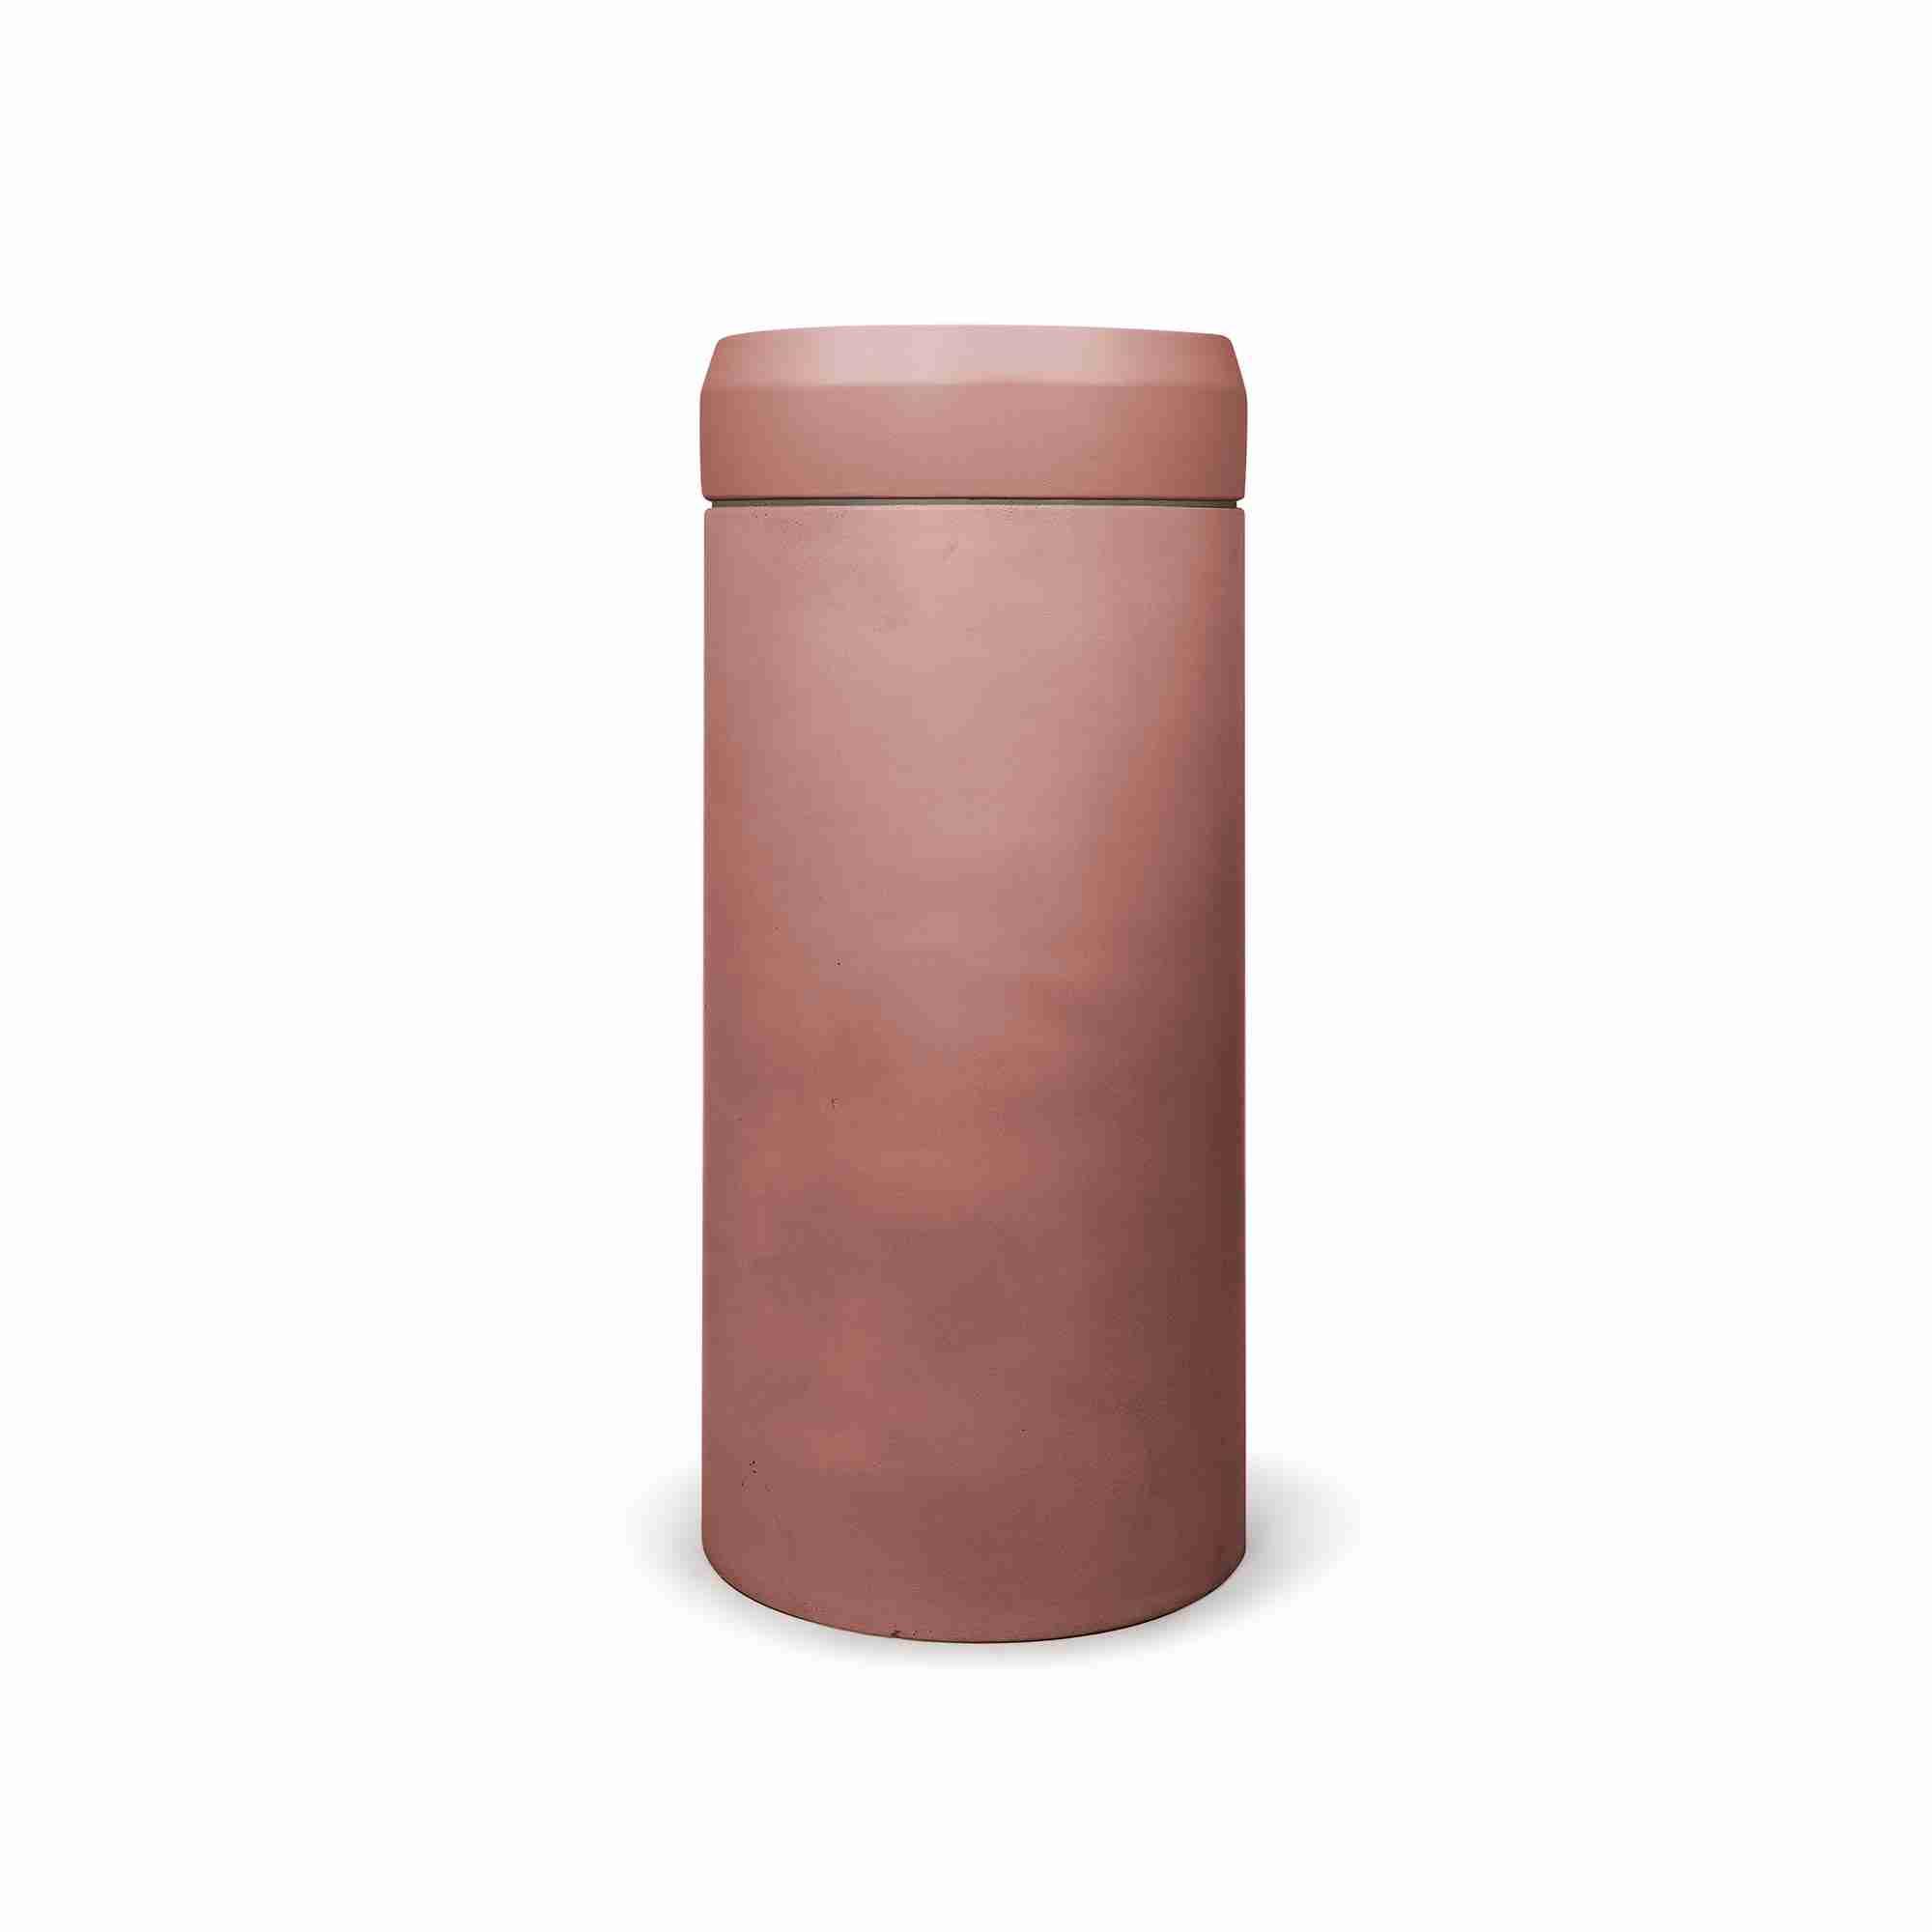 Prism Circle Basin Cylinder 13